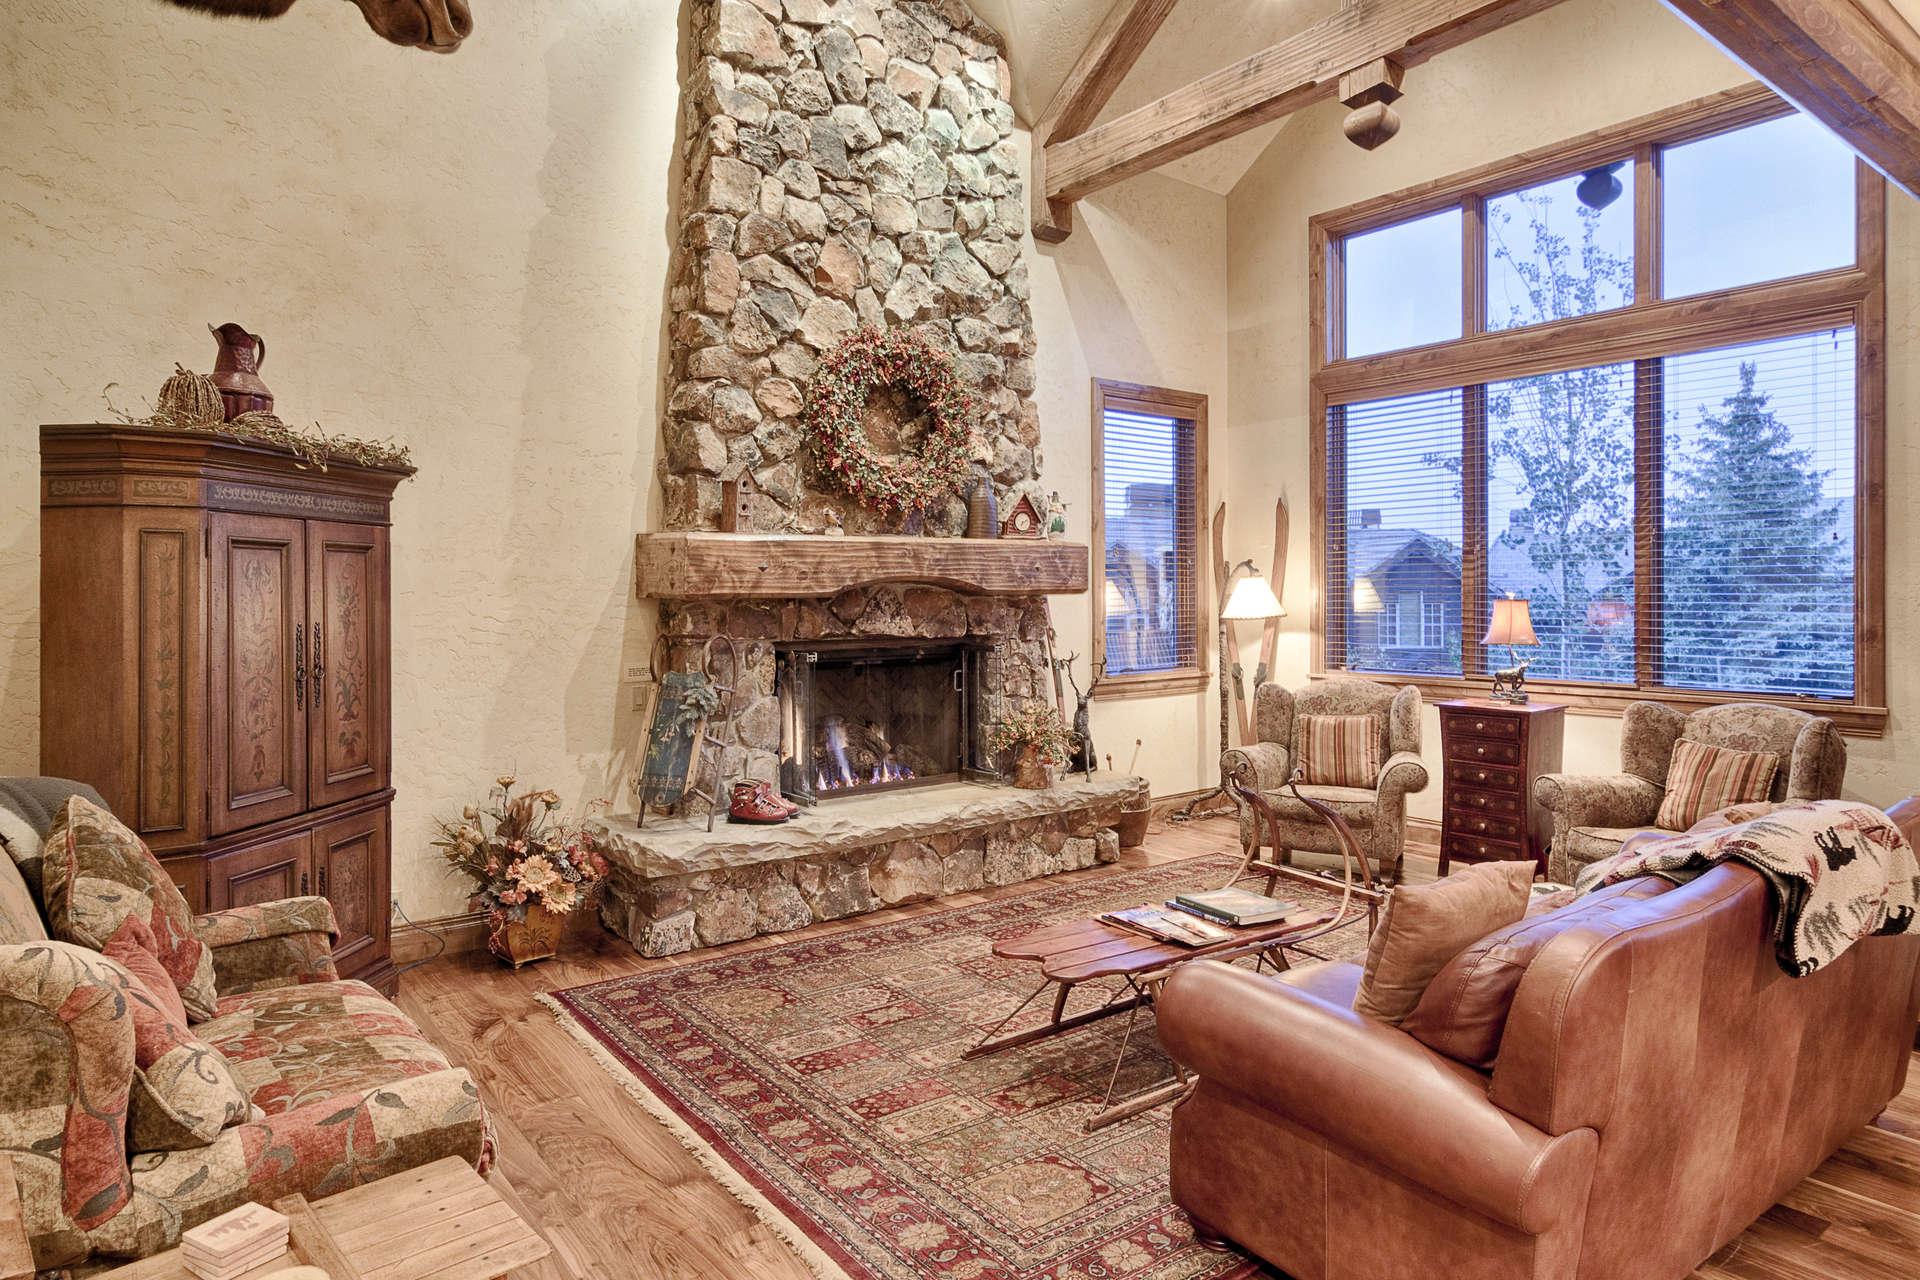 Luxury vacation rentals usa - Utah - Deer valley empire pass - Ironwood 21 - Image 1/8